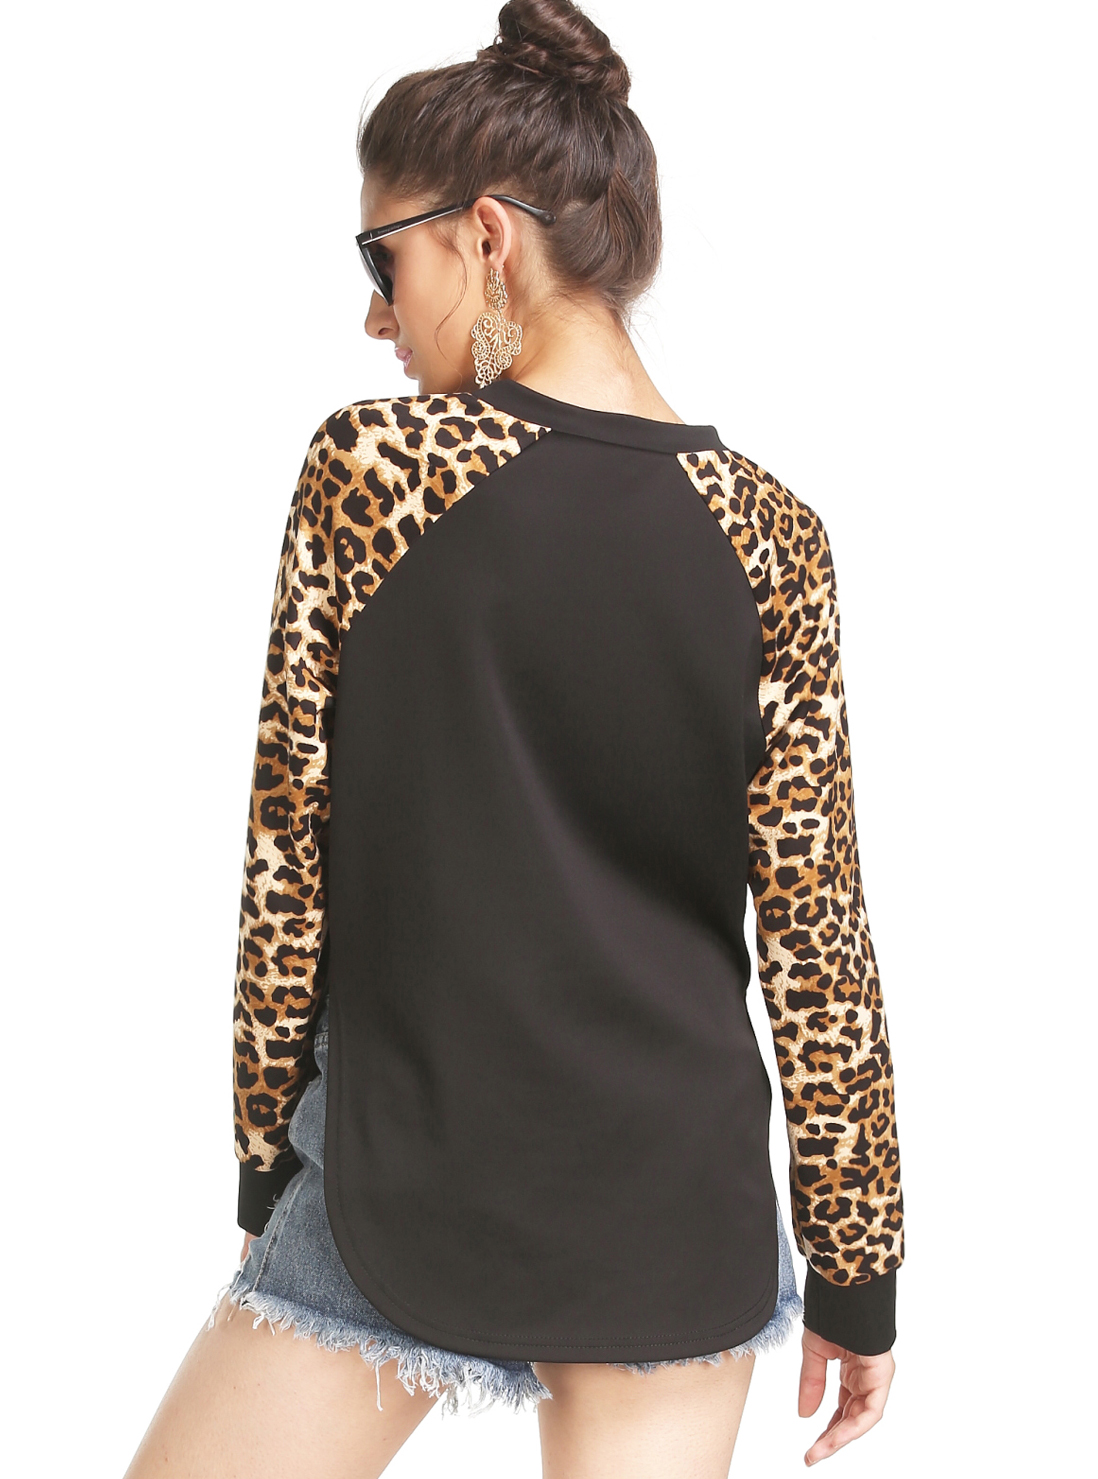 Black Leopard Print Sleeve Sweatshirt - Sheinside.com